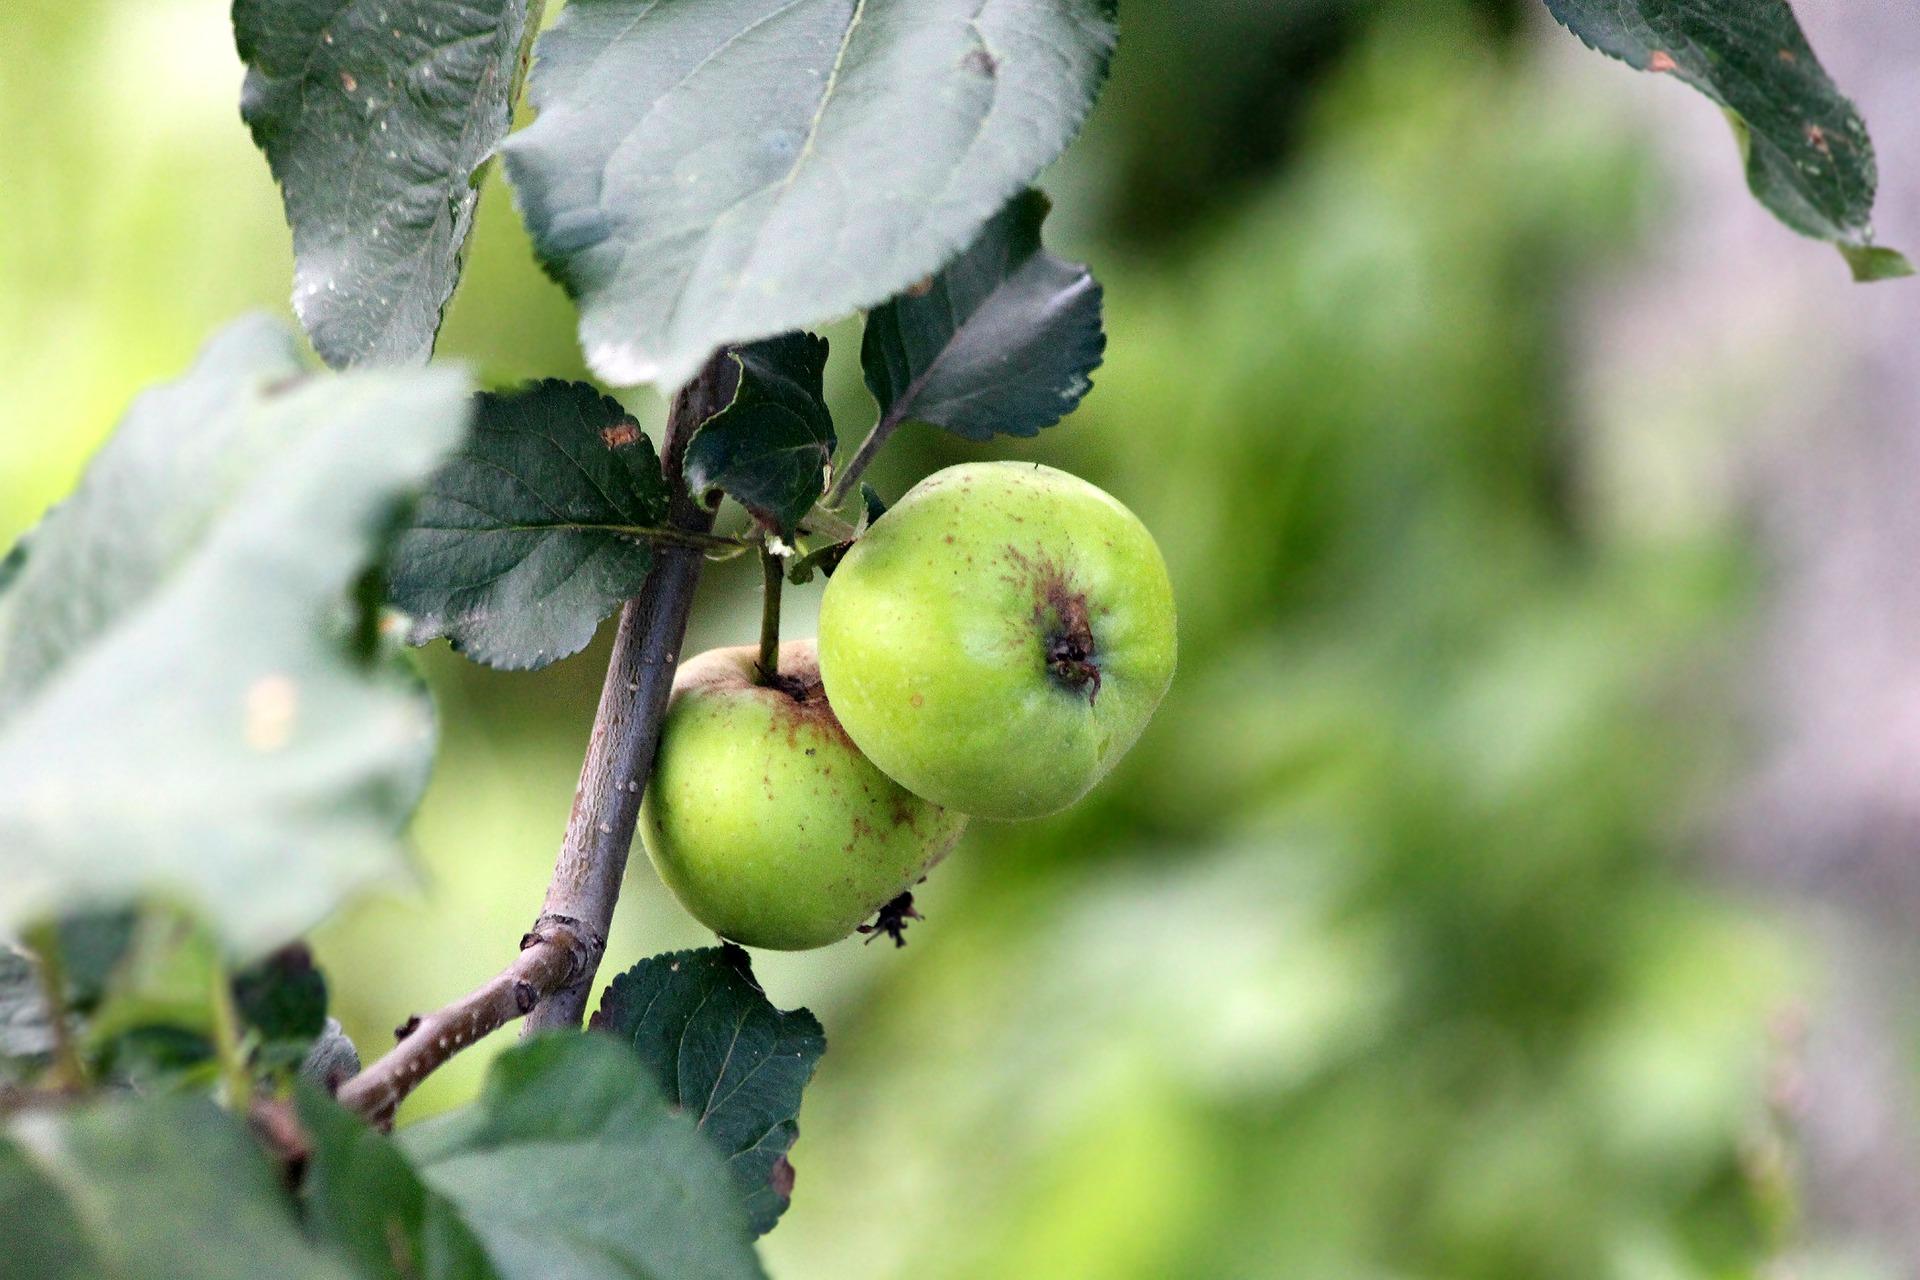 apples-3077619_1920.jpg